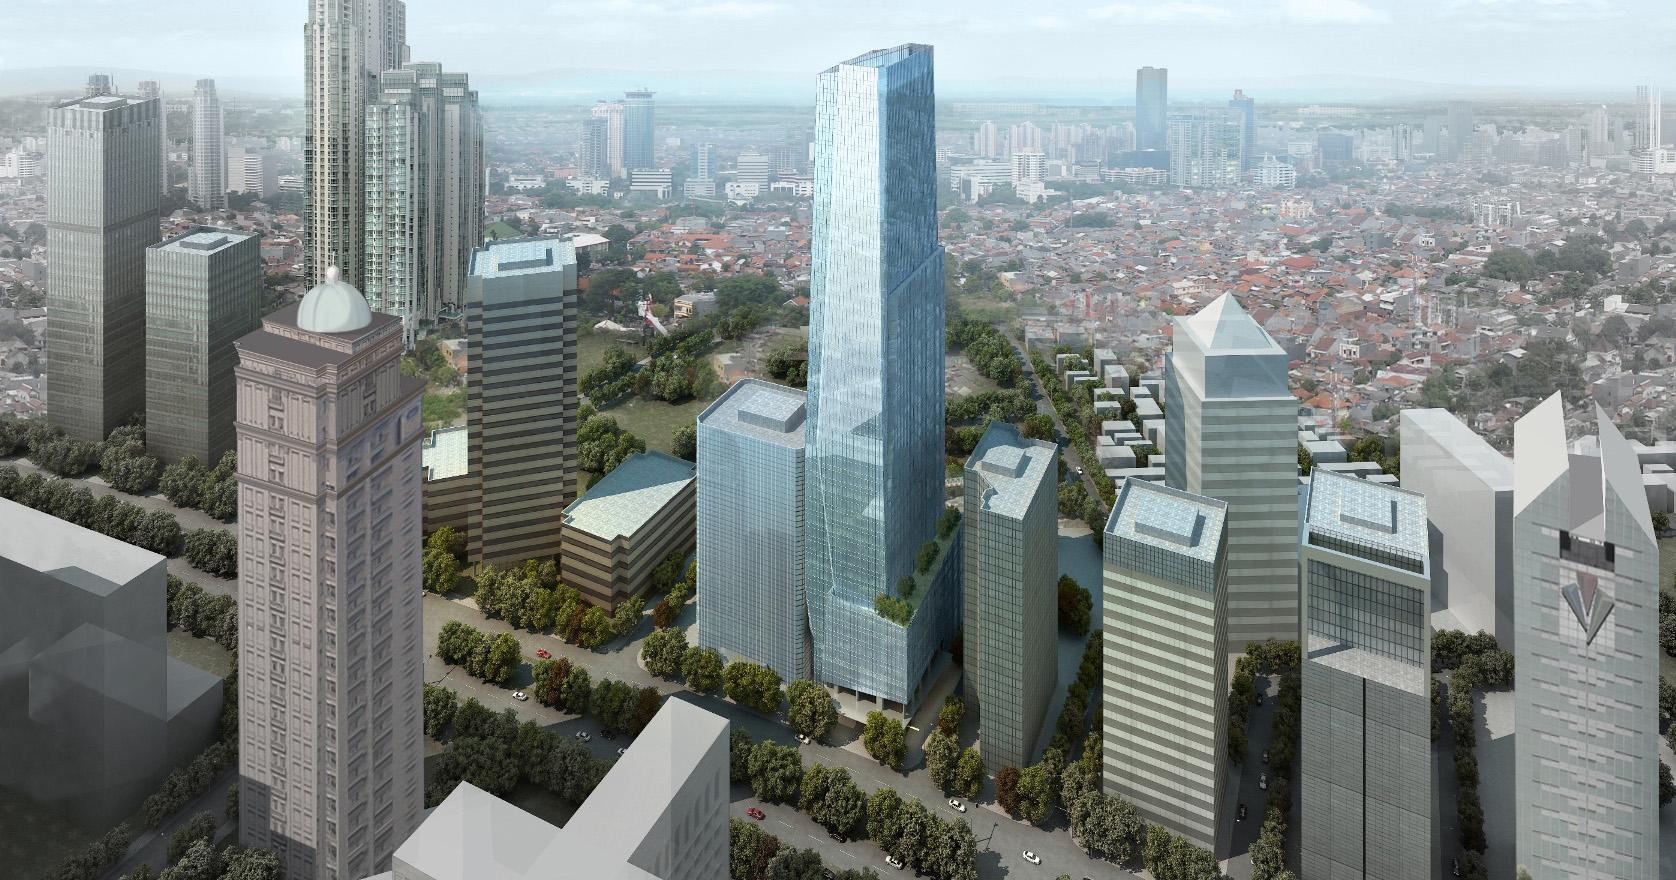 Gedung Perkantoran Milik Raksasa Properti Singapura, Mulai Beroperasi di Semester Kedua 2016